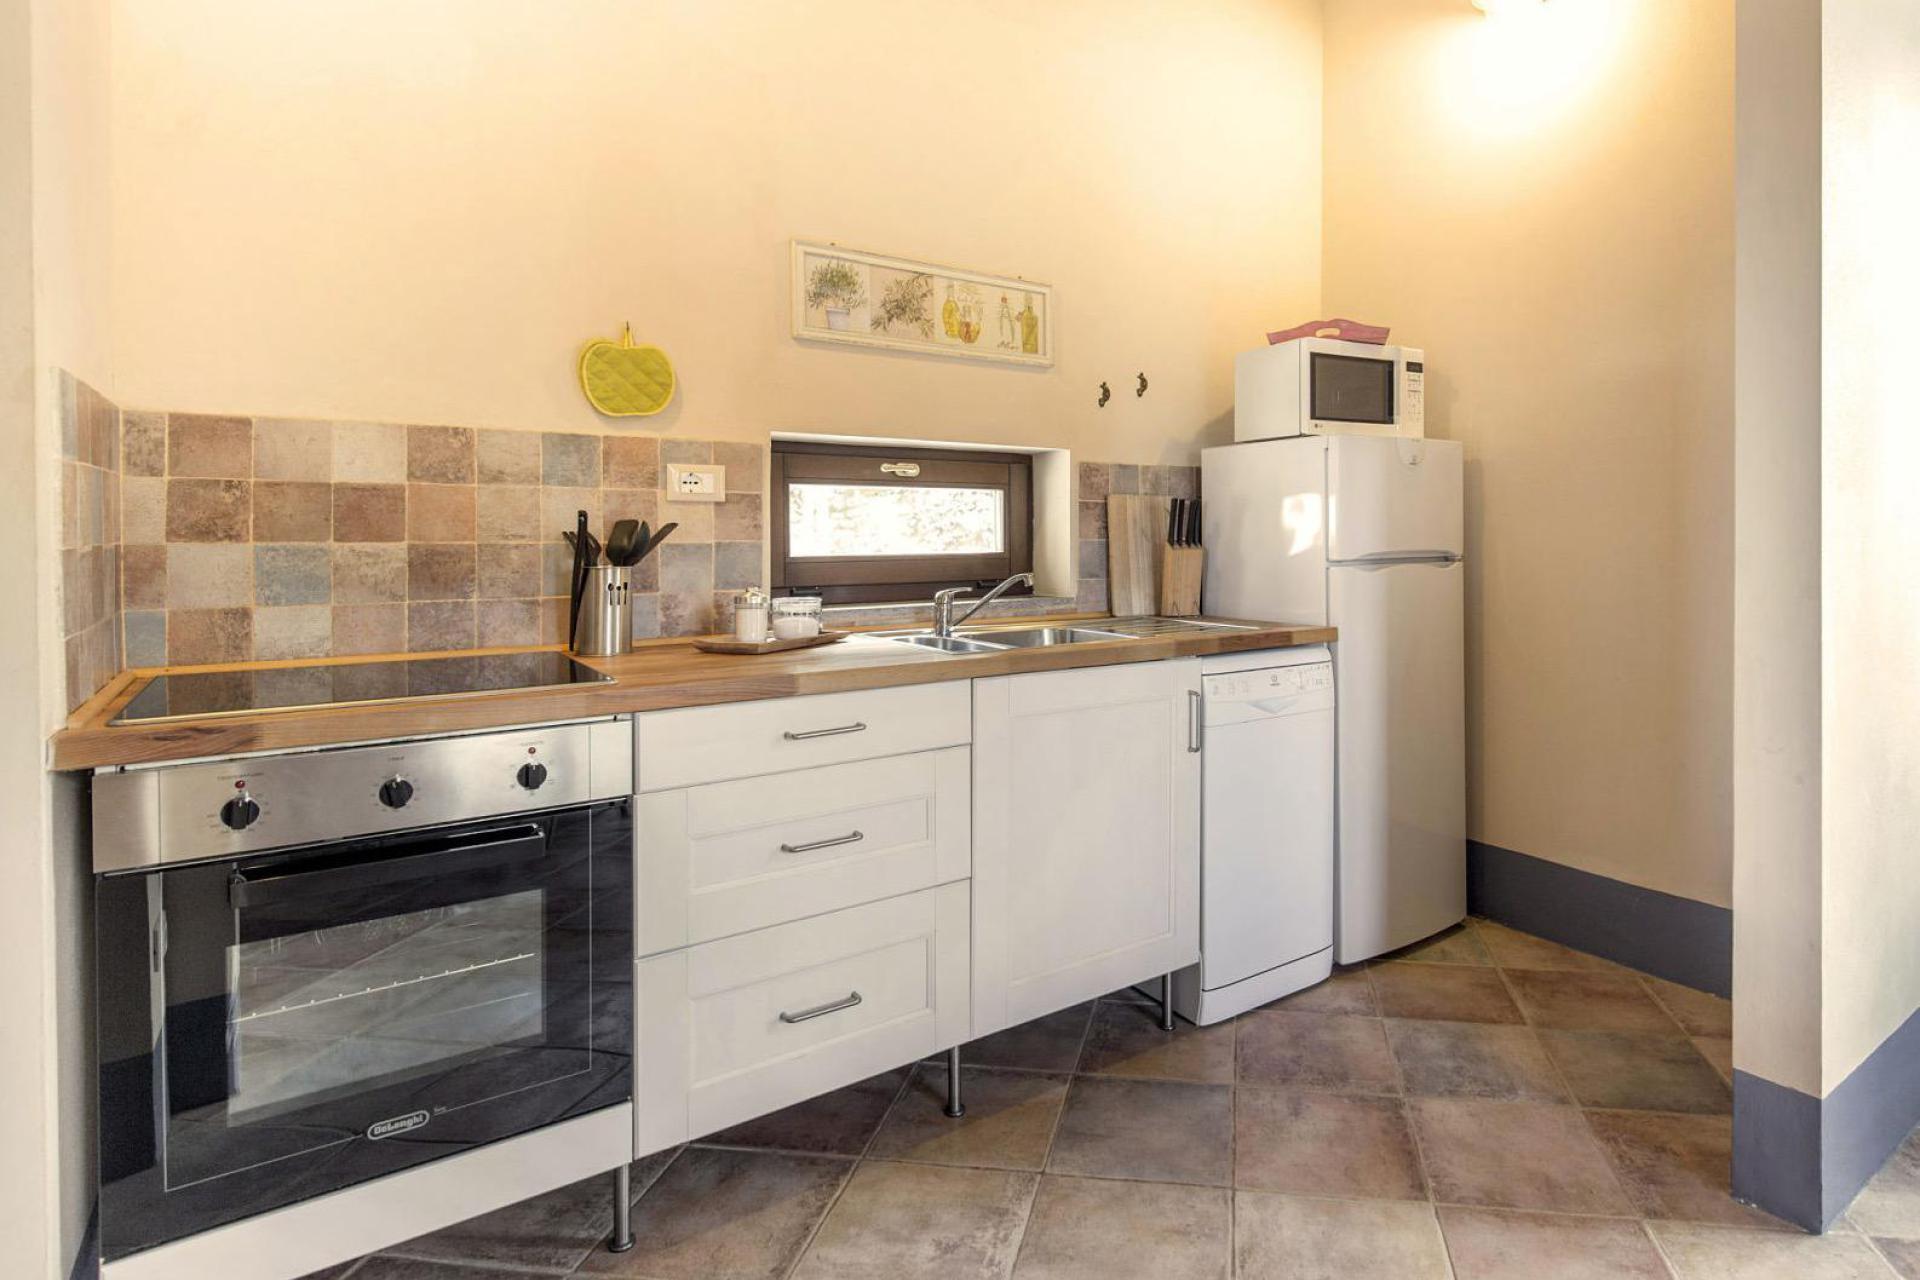 Agriturismo Toskana Appartement Maremma - luxuriöse und ruhig   myitalyselection.de